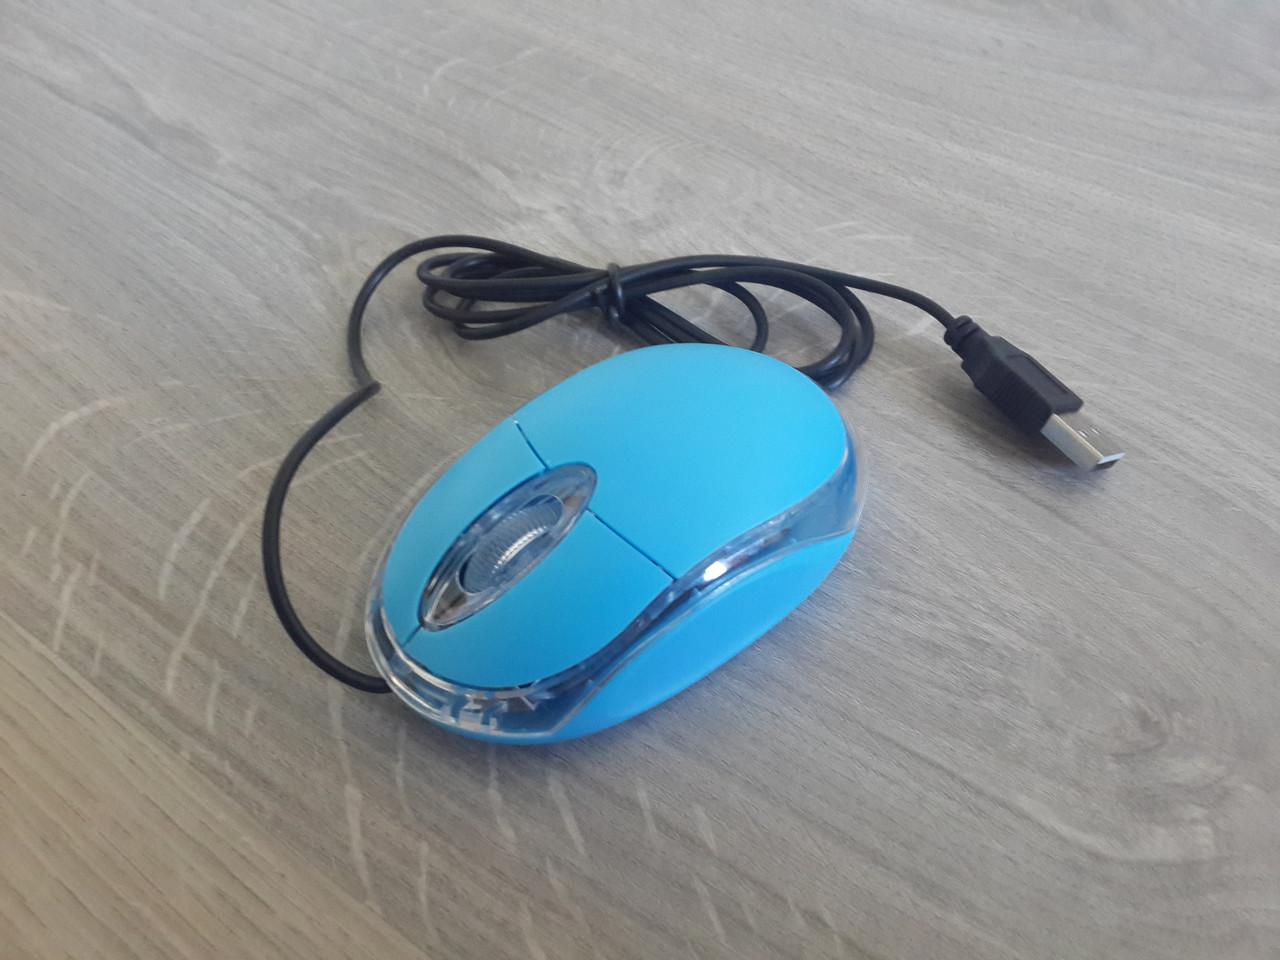 USB мышь c подсветкой